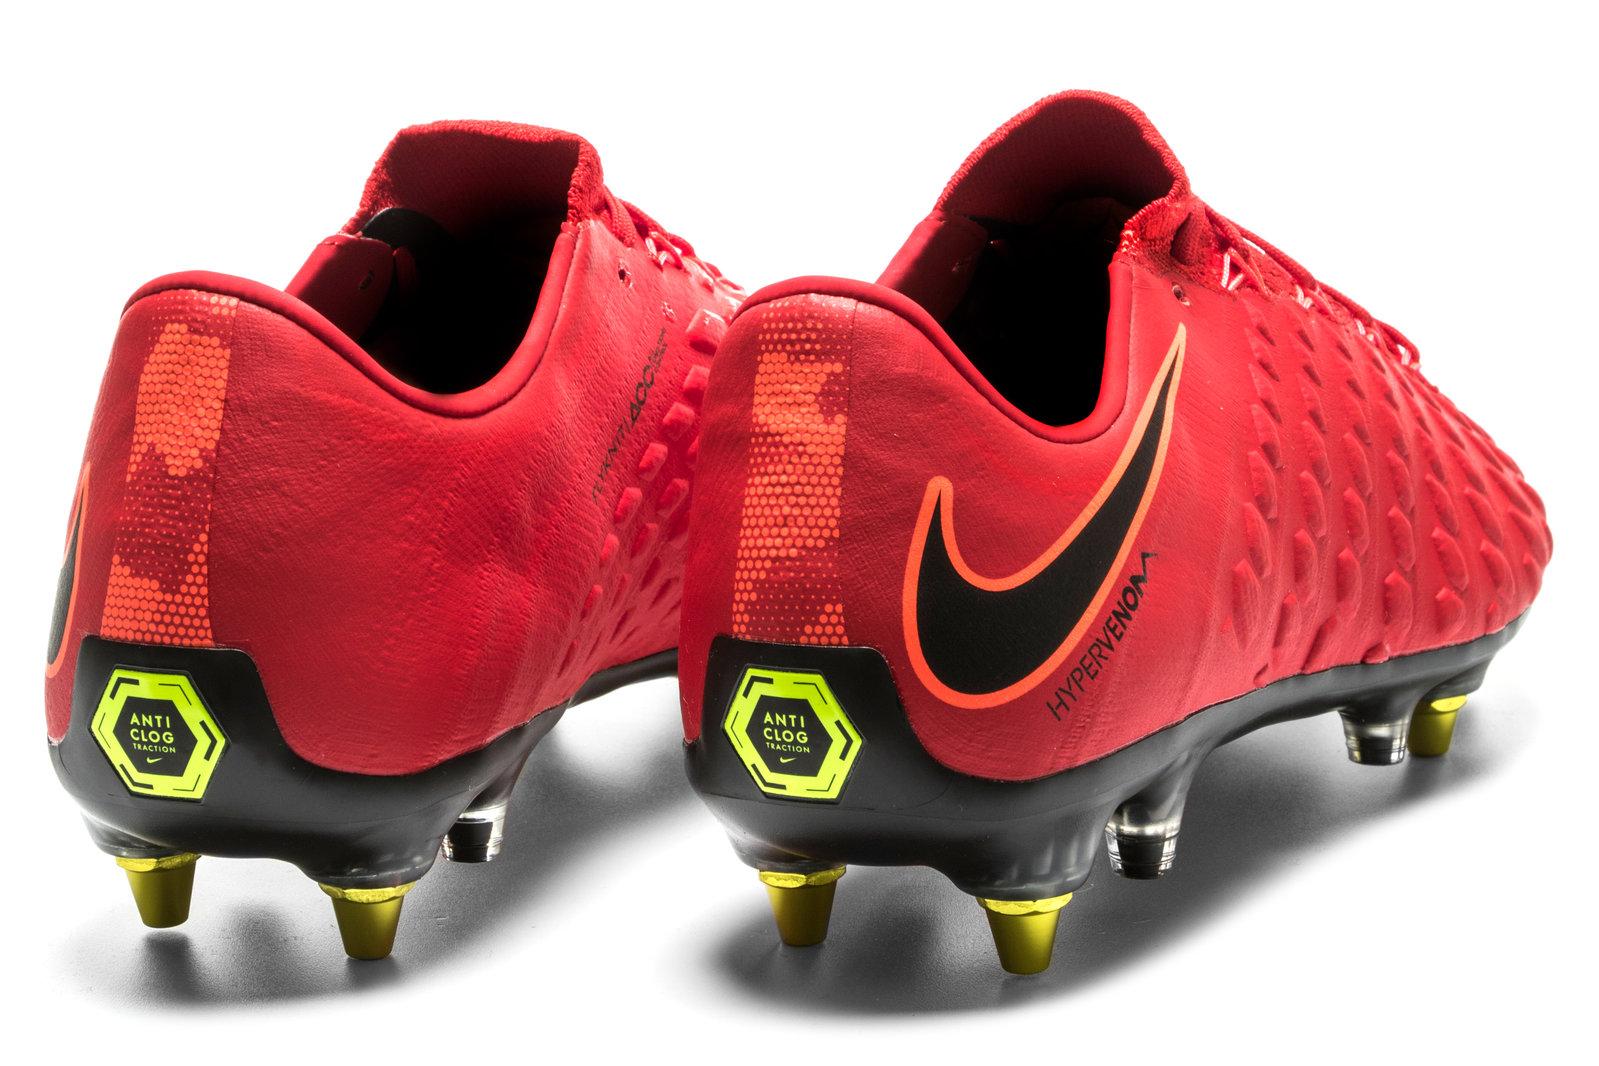 sports shoes be5bf 05ed1 Nike Mens Hypervenom Phantom III Anti-Clog SG Pro Football Boots